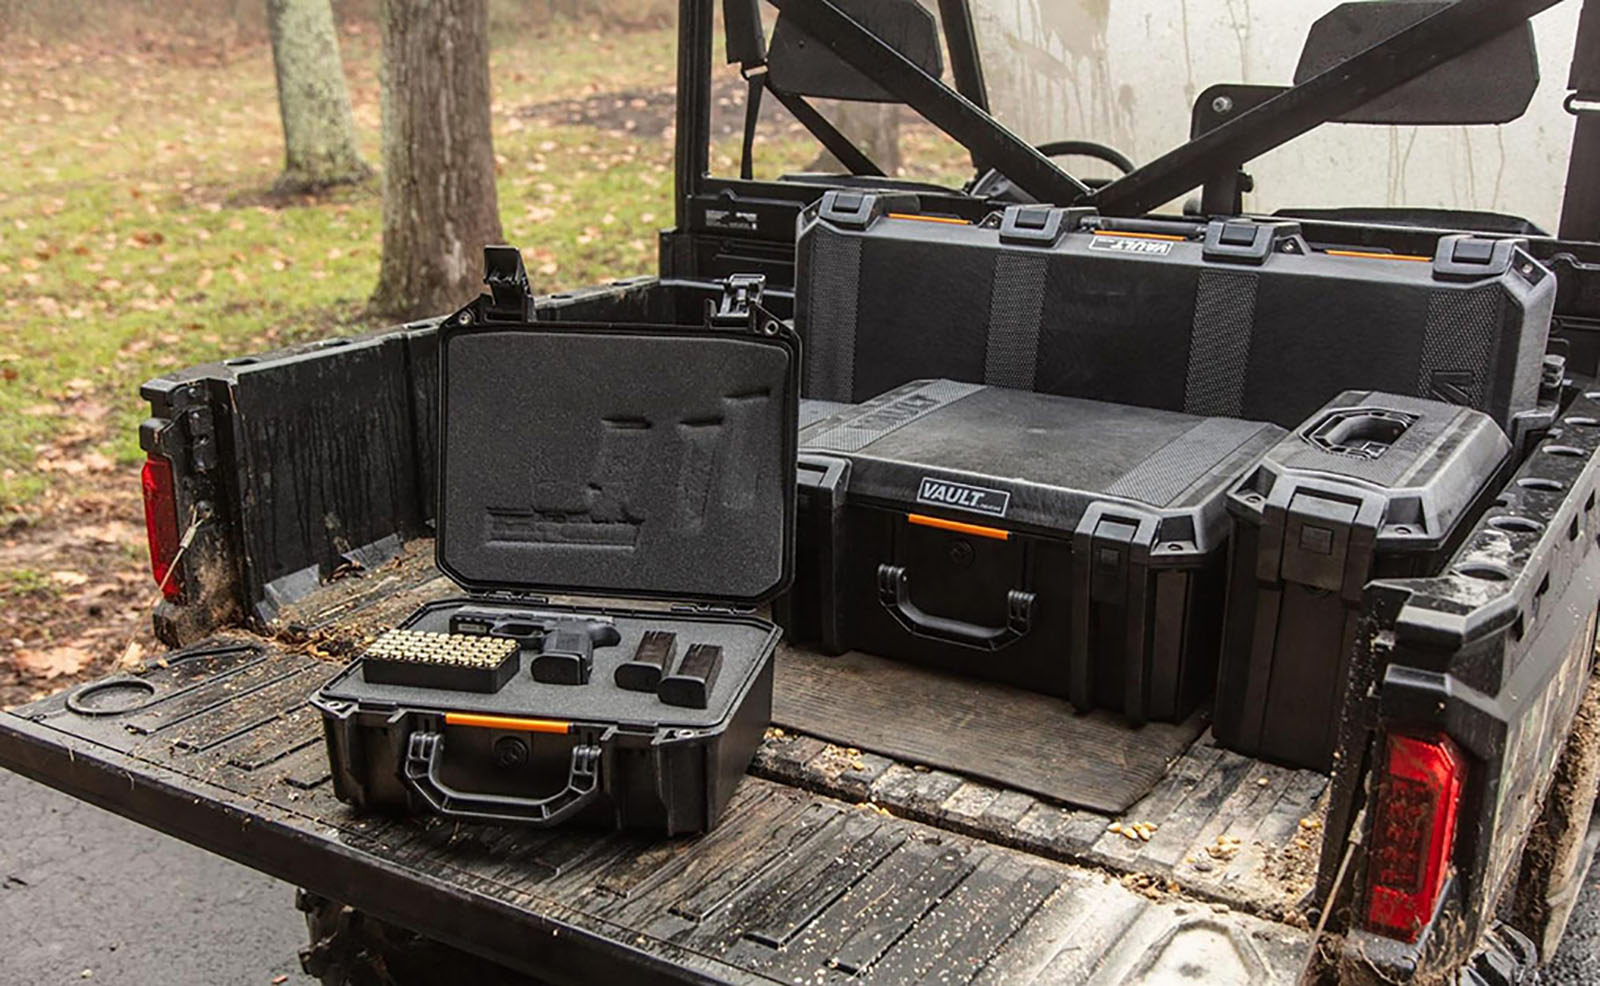 vault gun cases cleaning supplies